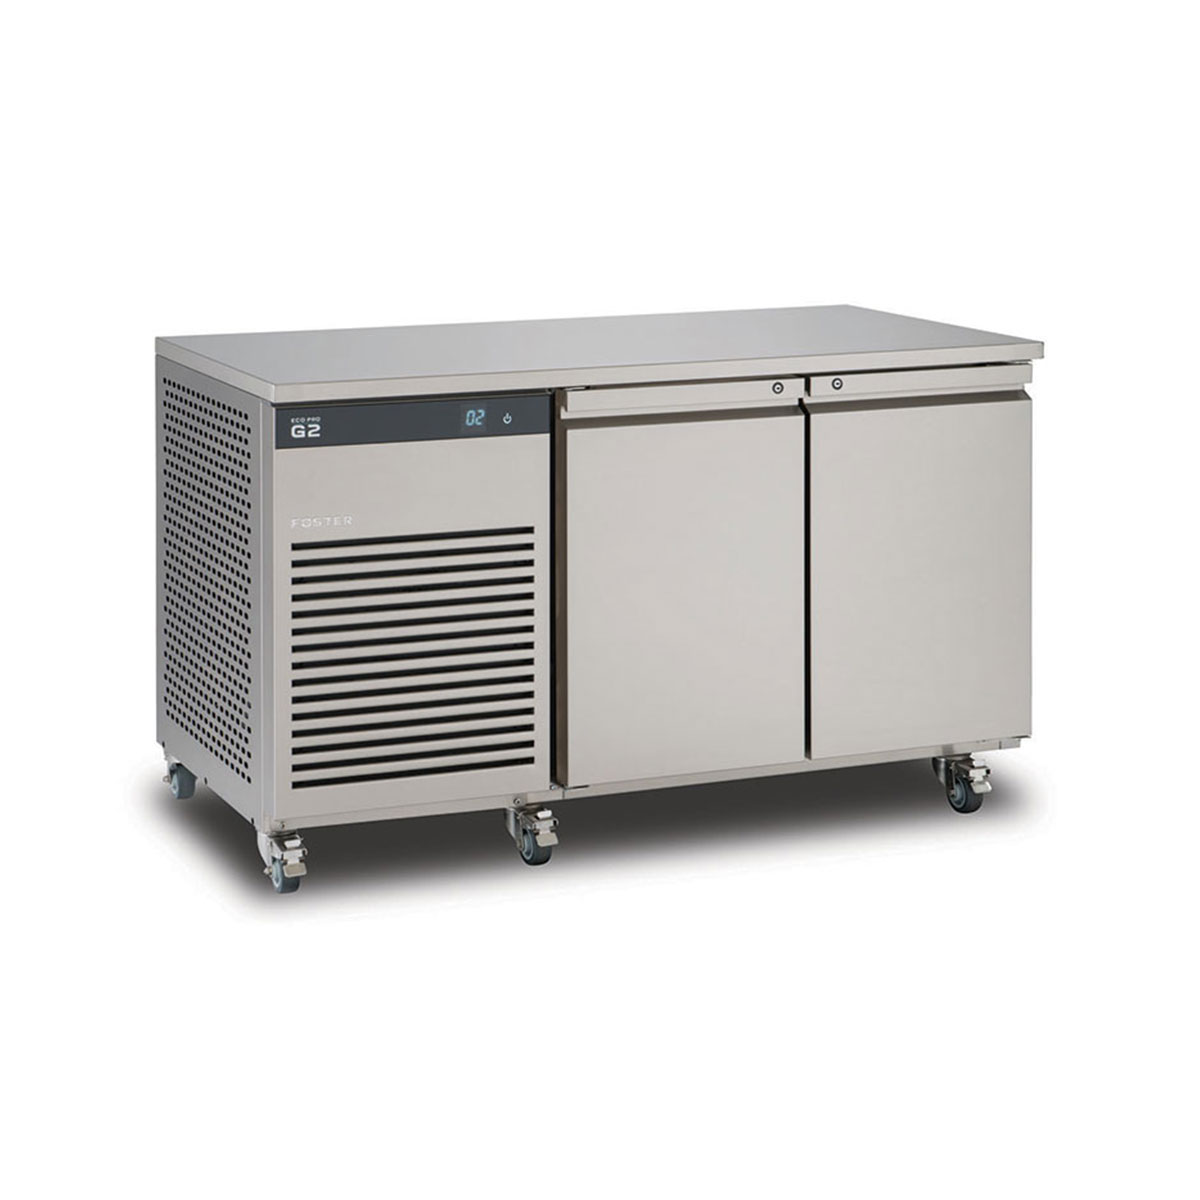 Foster EcoPro G2 2 Door Counter 1 - Refrigeration Equipment Suppliers in Cornwall